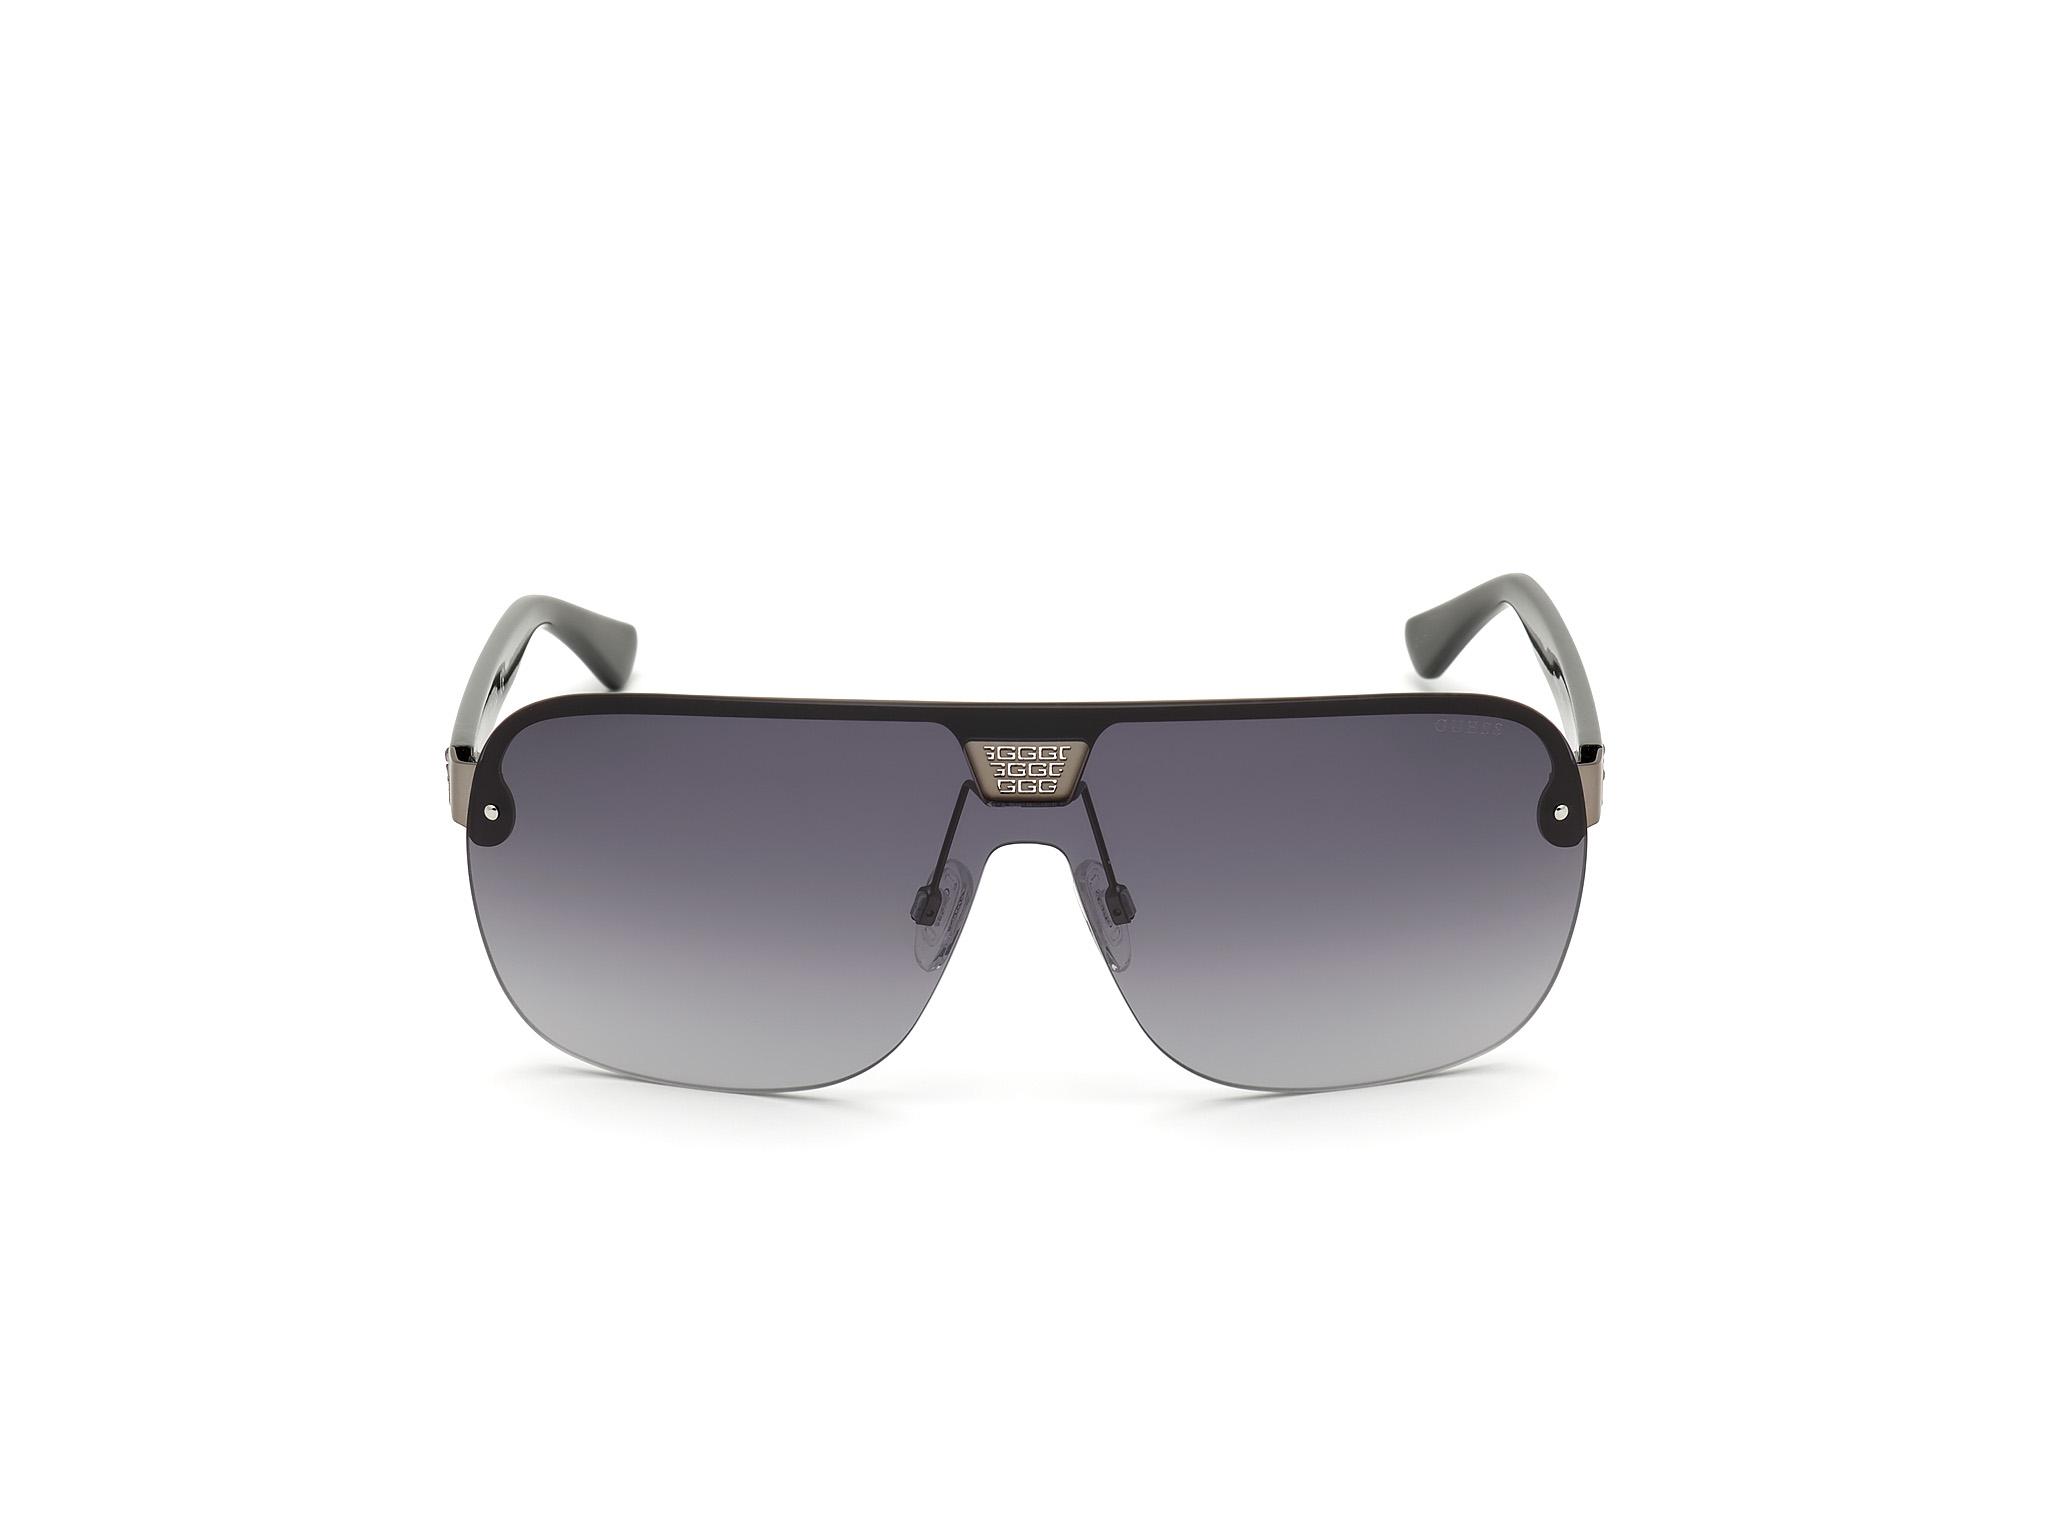 GUESS | Guess Black Frame With Grey Lens Shield Shape Men Sunglass